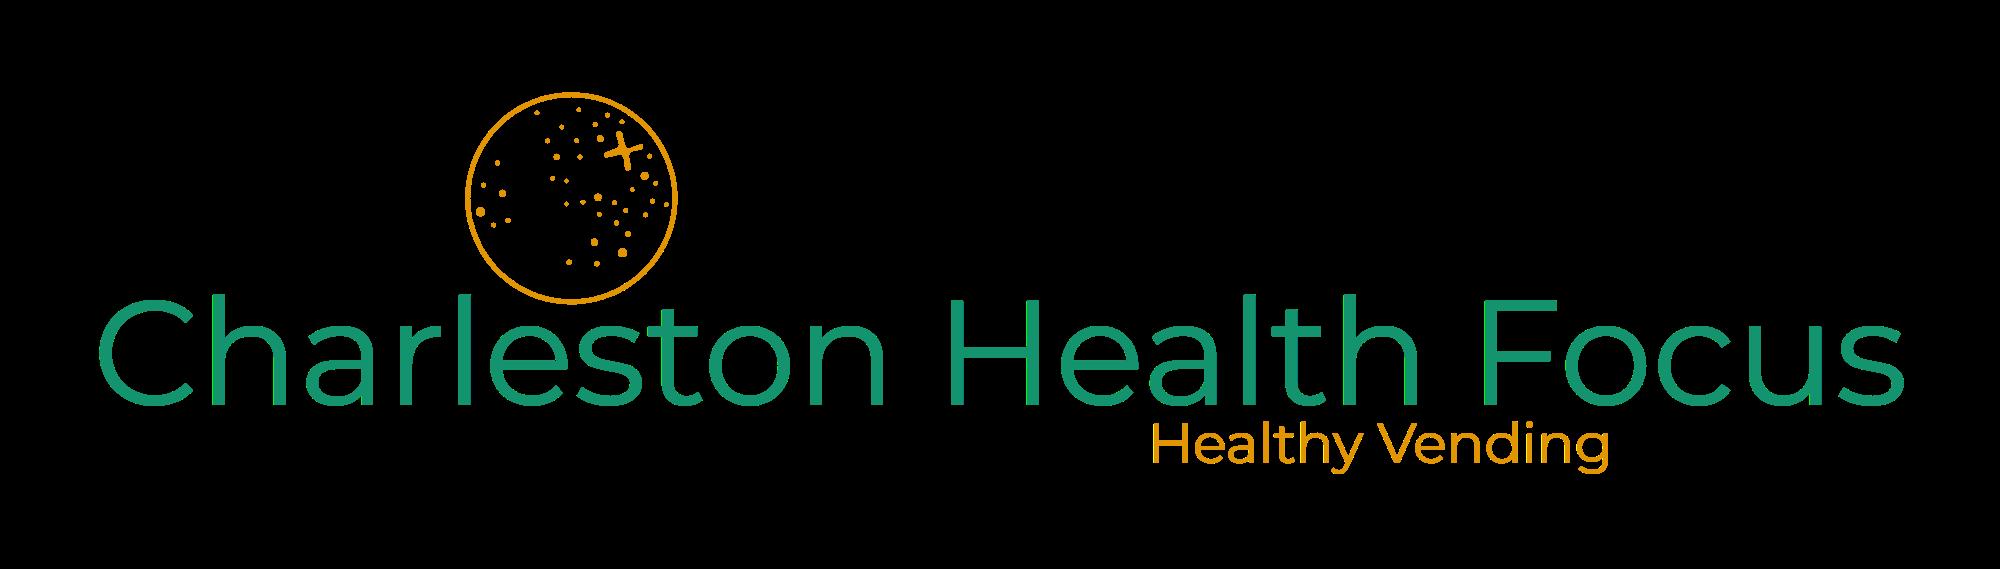 Charleston Health Focus-logo.png